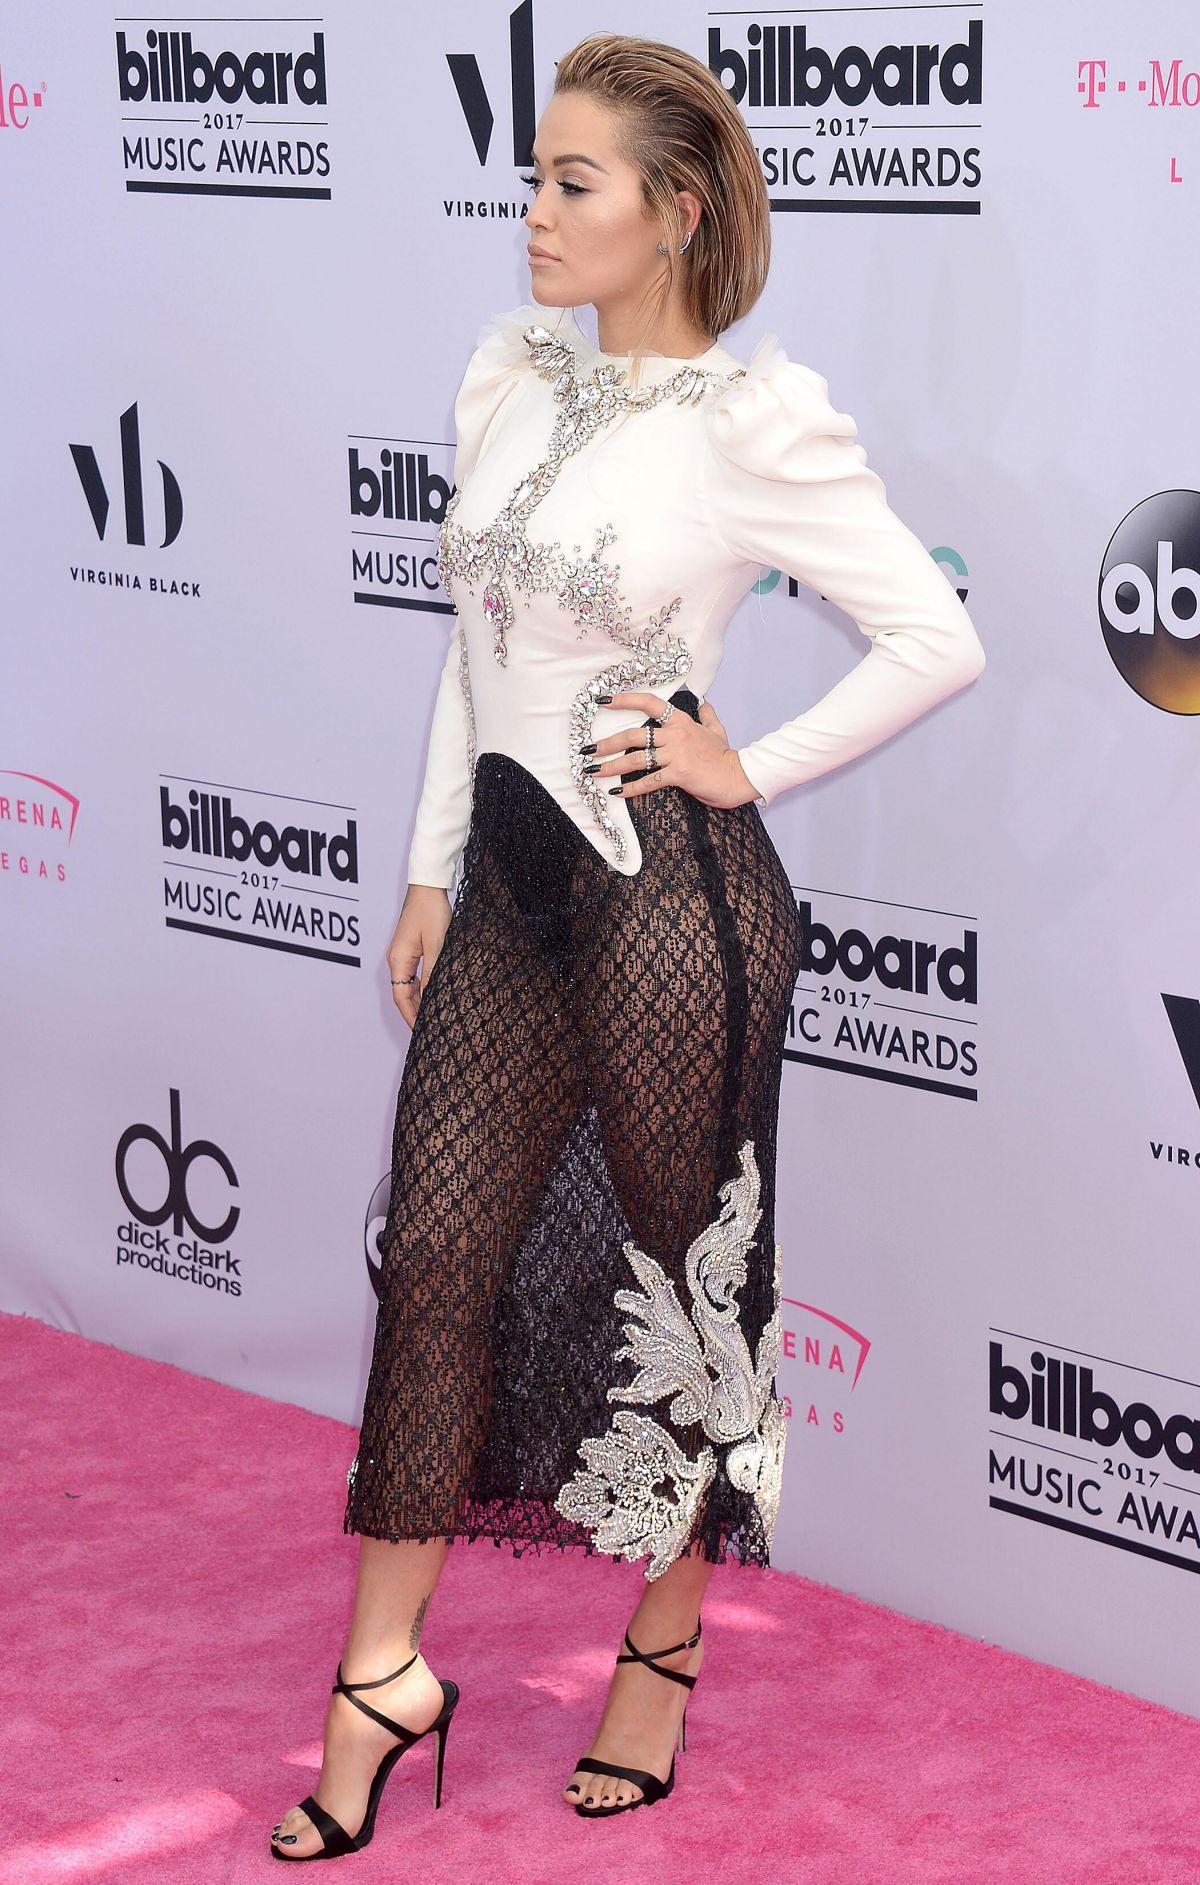 RITA ORA at Billboard Music Awards 2017 in Las Vegas 05/21/2017 - HawtCelebs